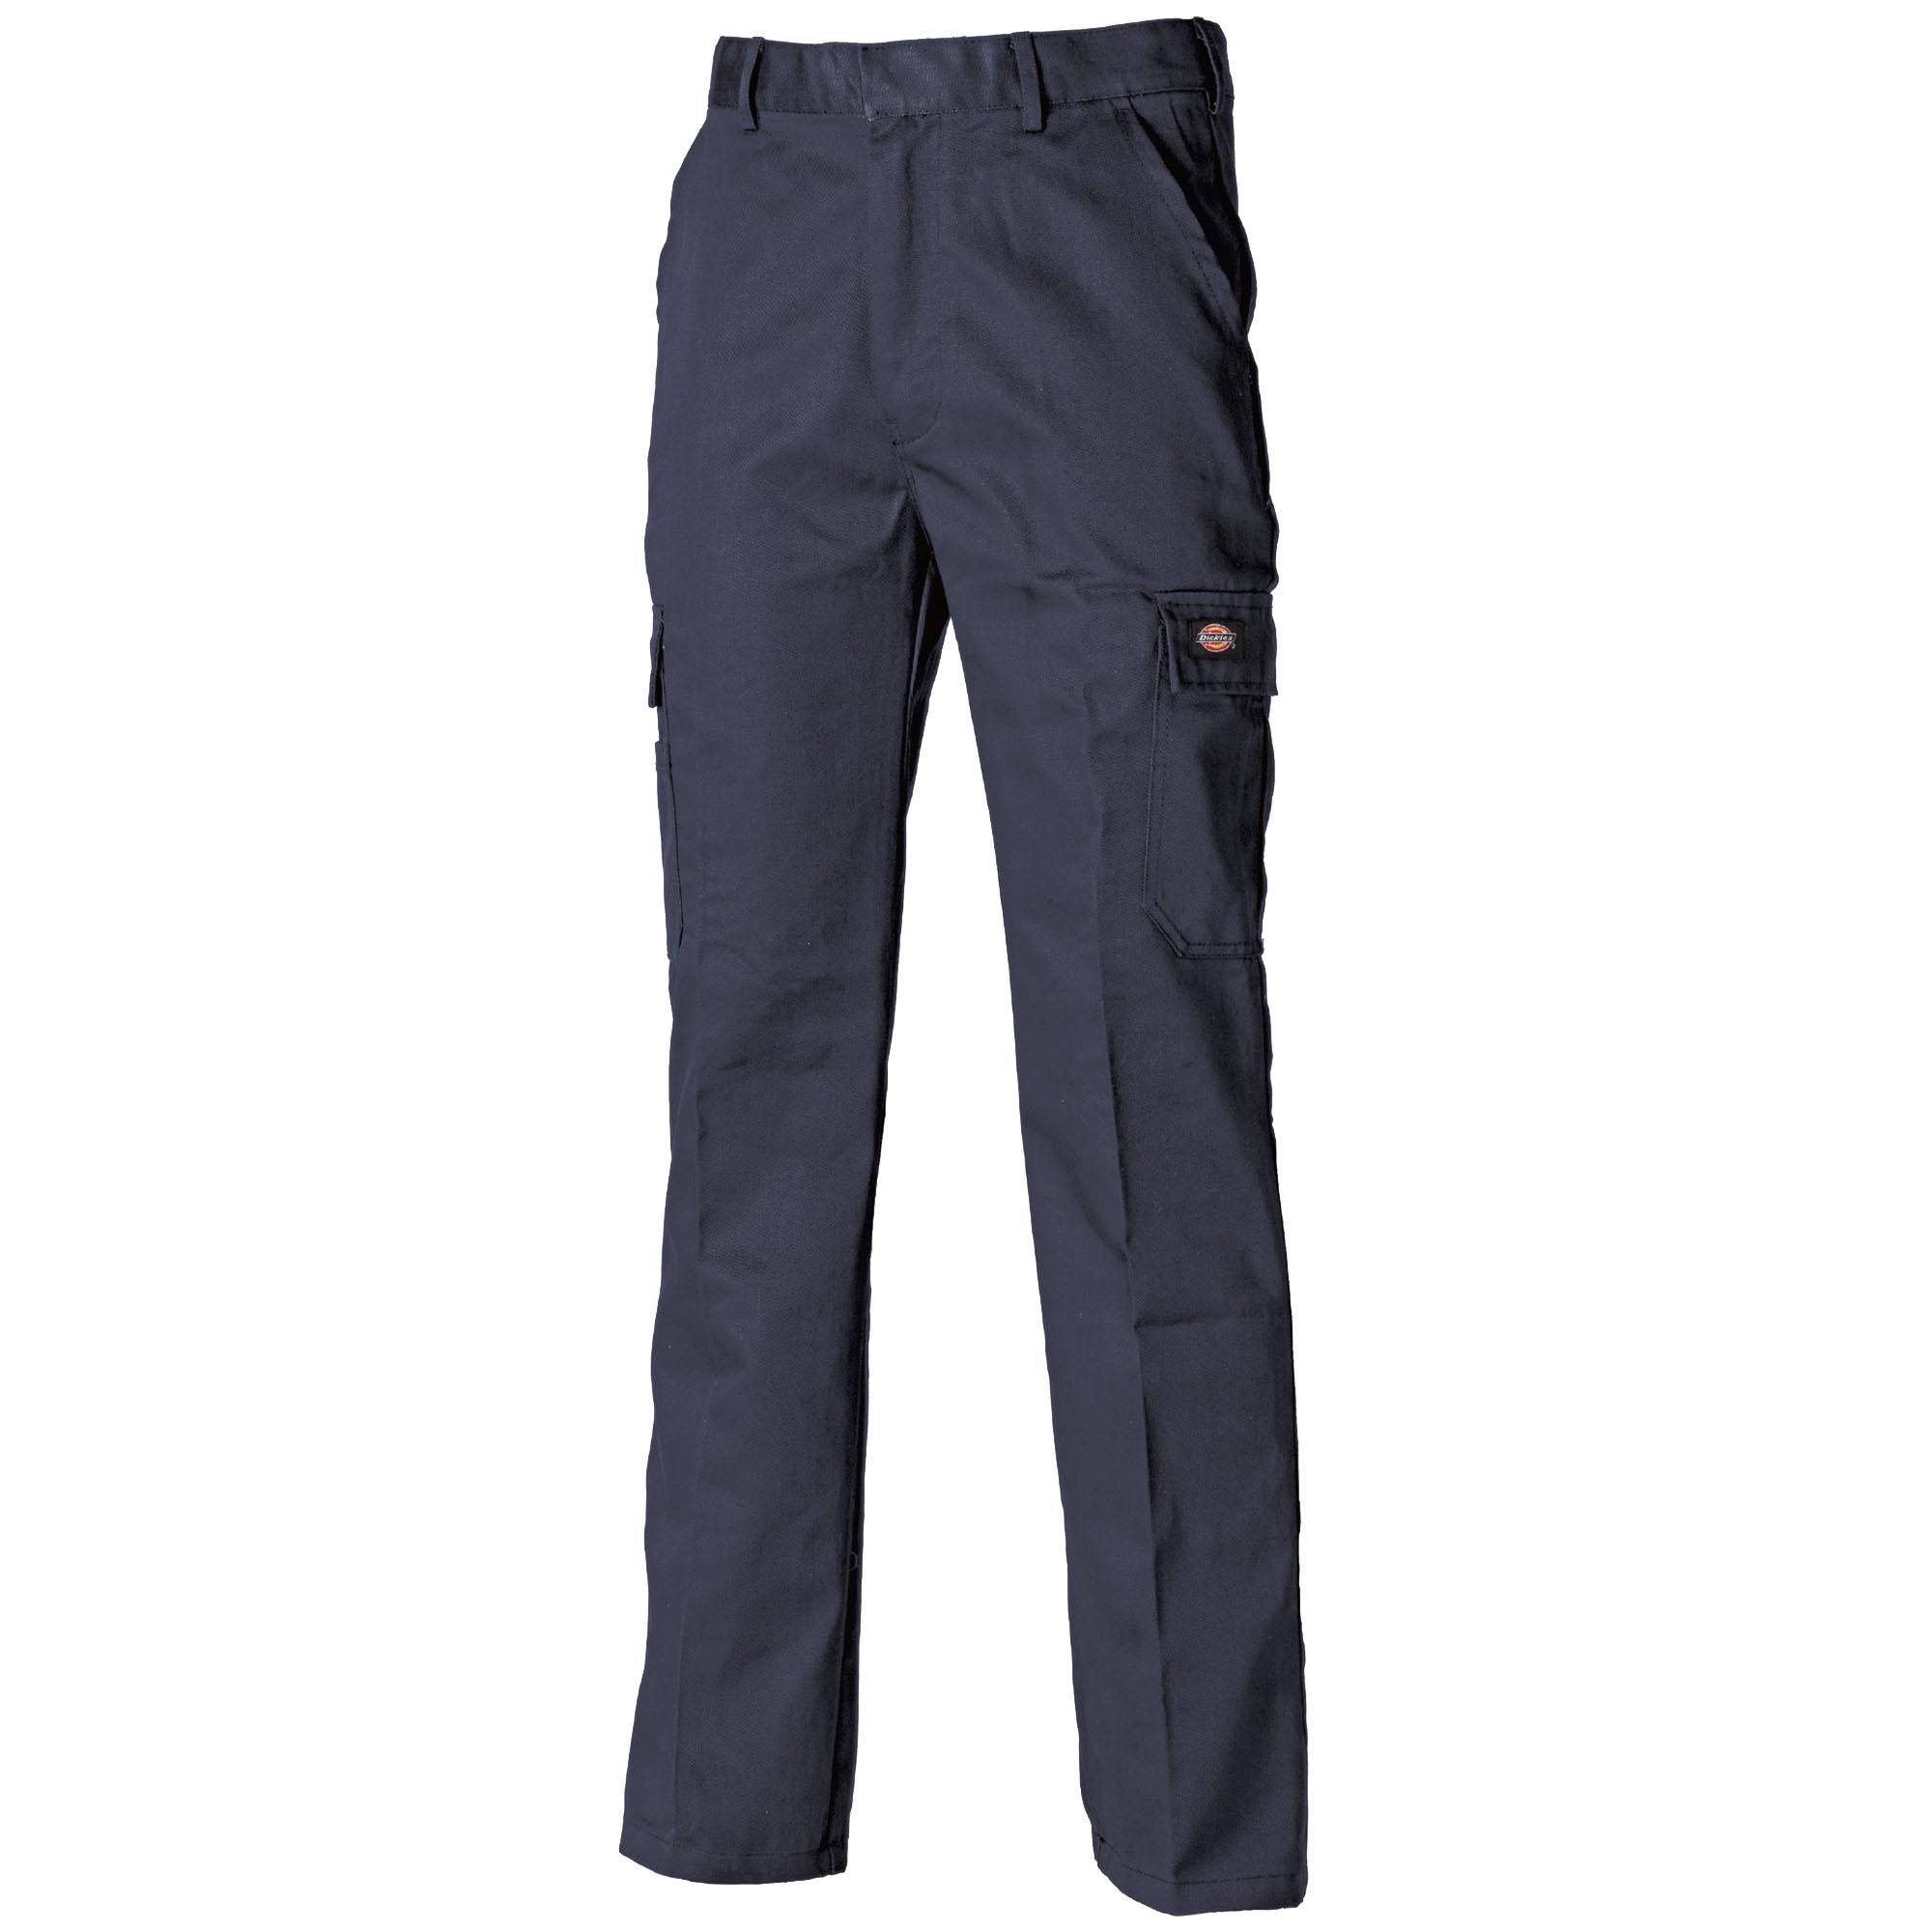 Dickies Mens Redhawk Chino Trousers (42/L) (Navy)